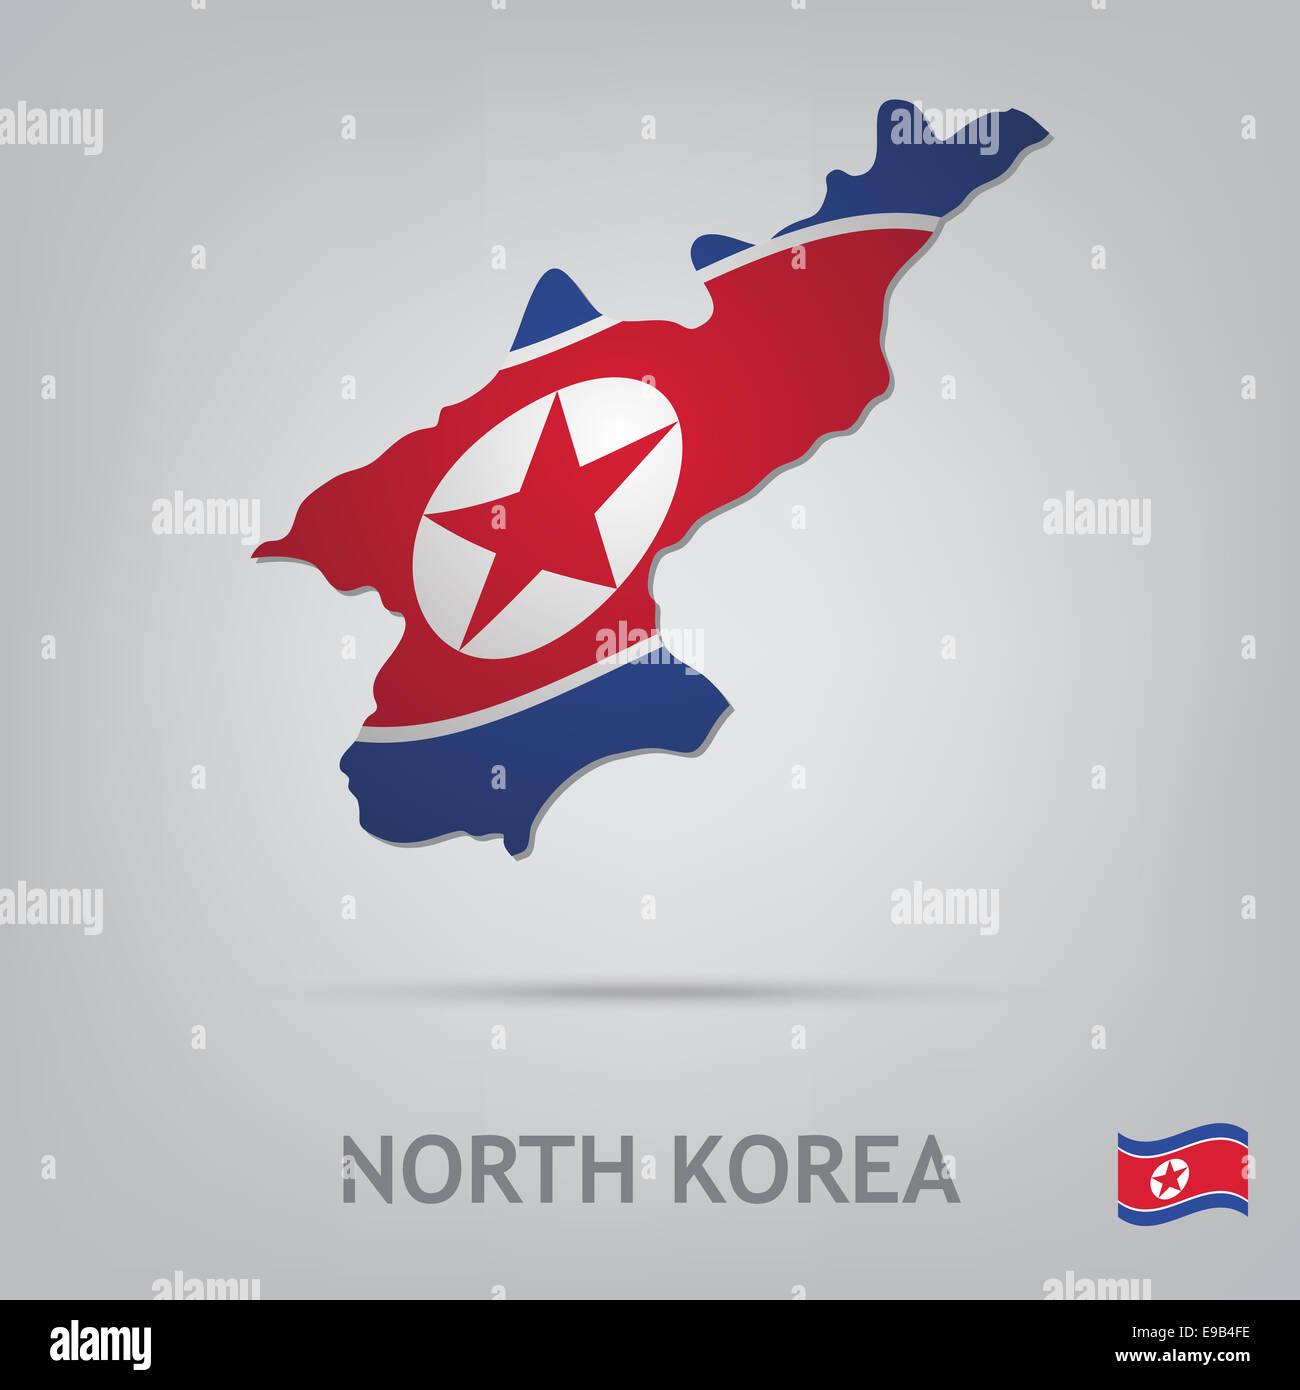 north korea - Stock Image